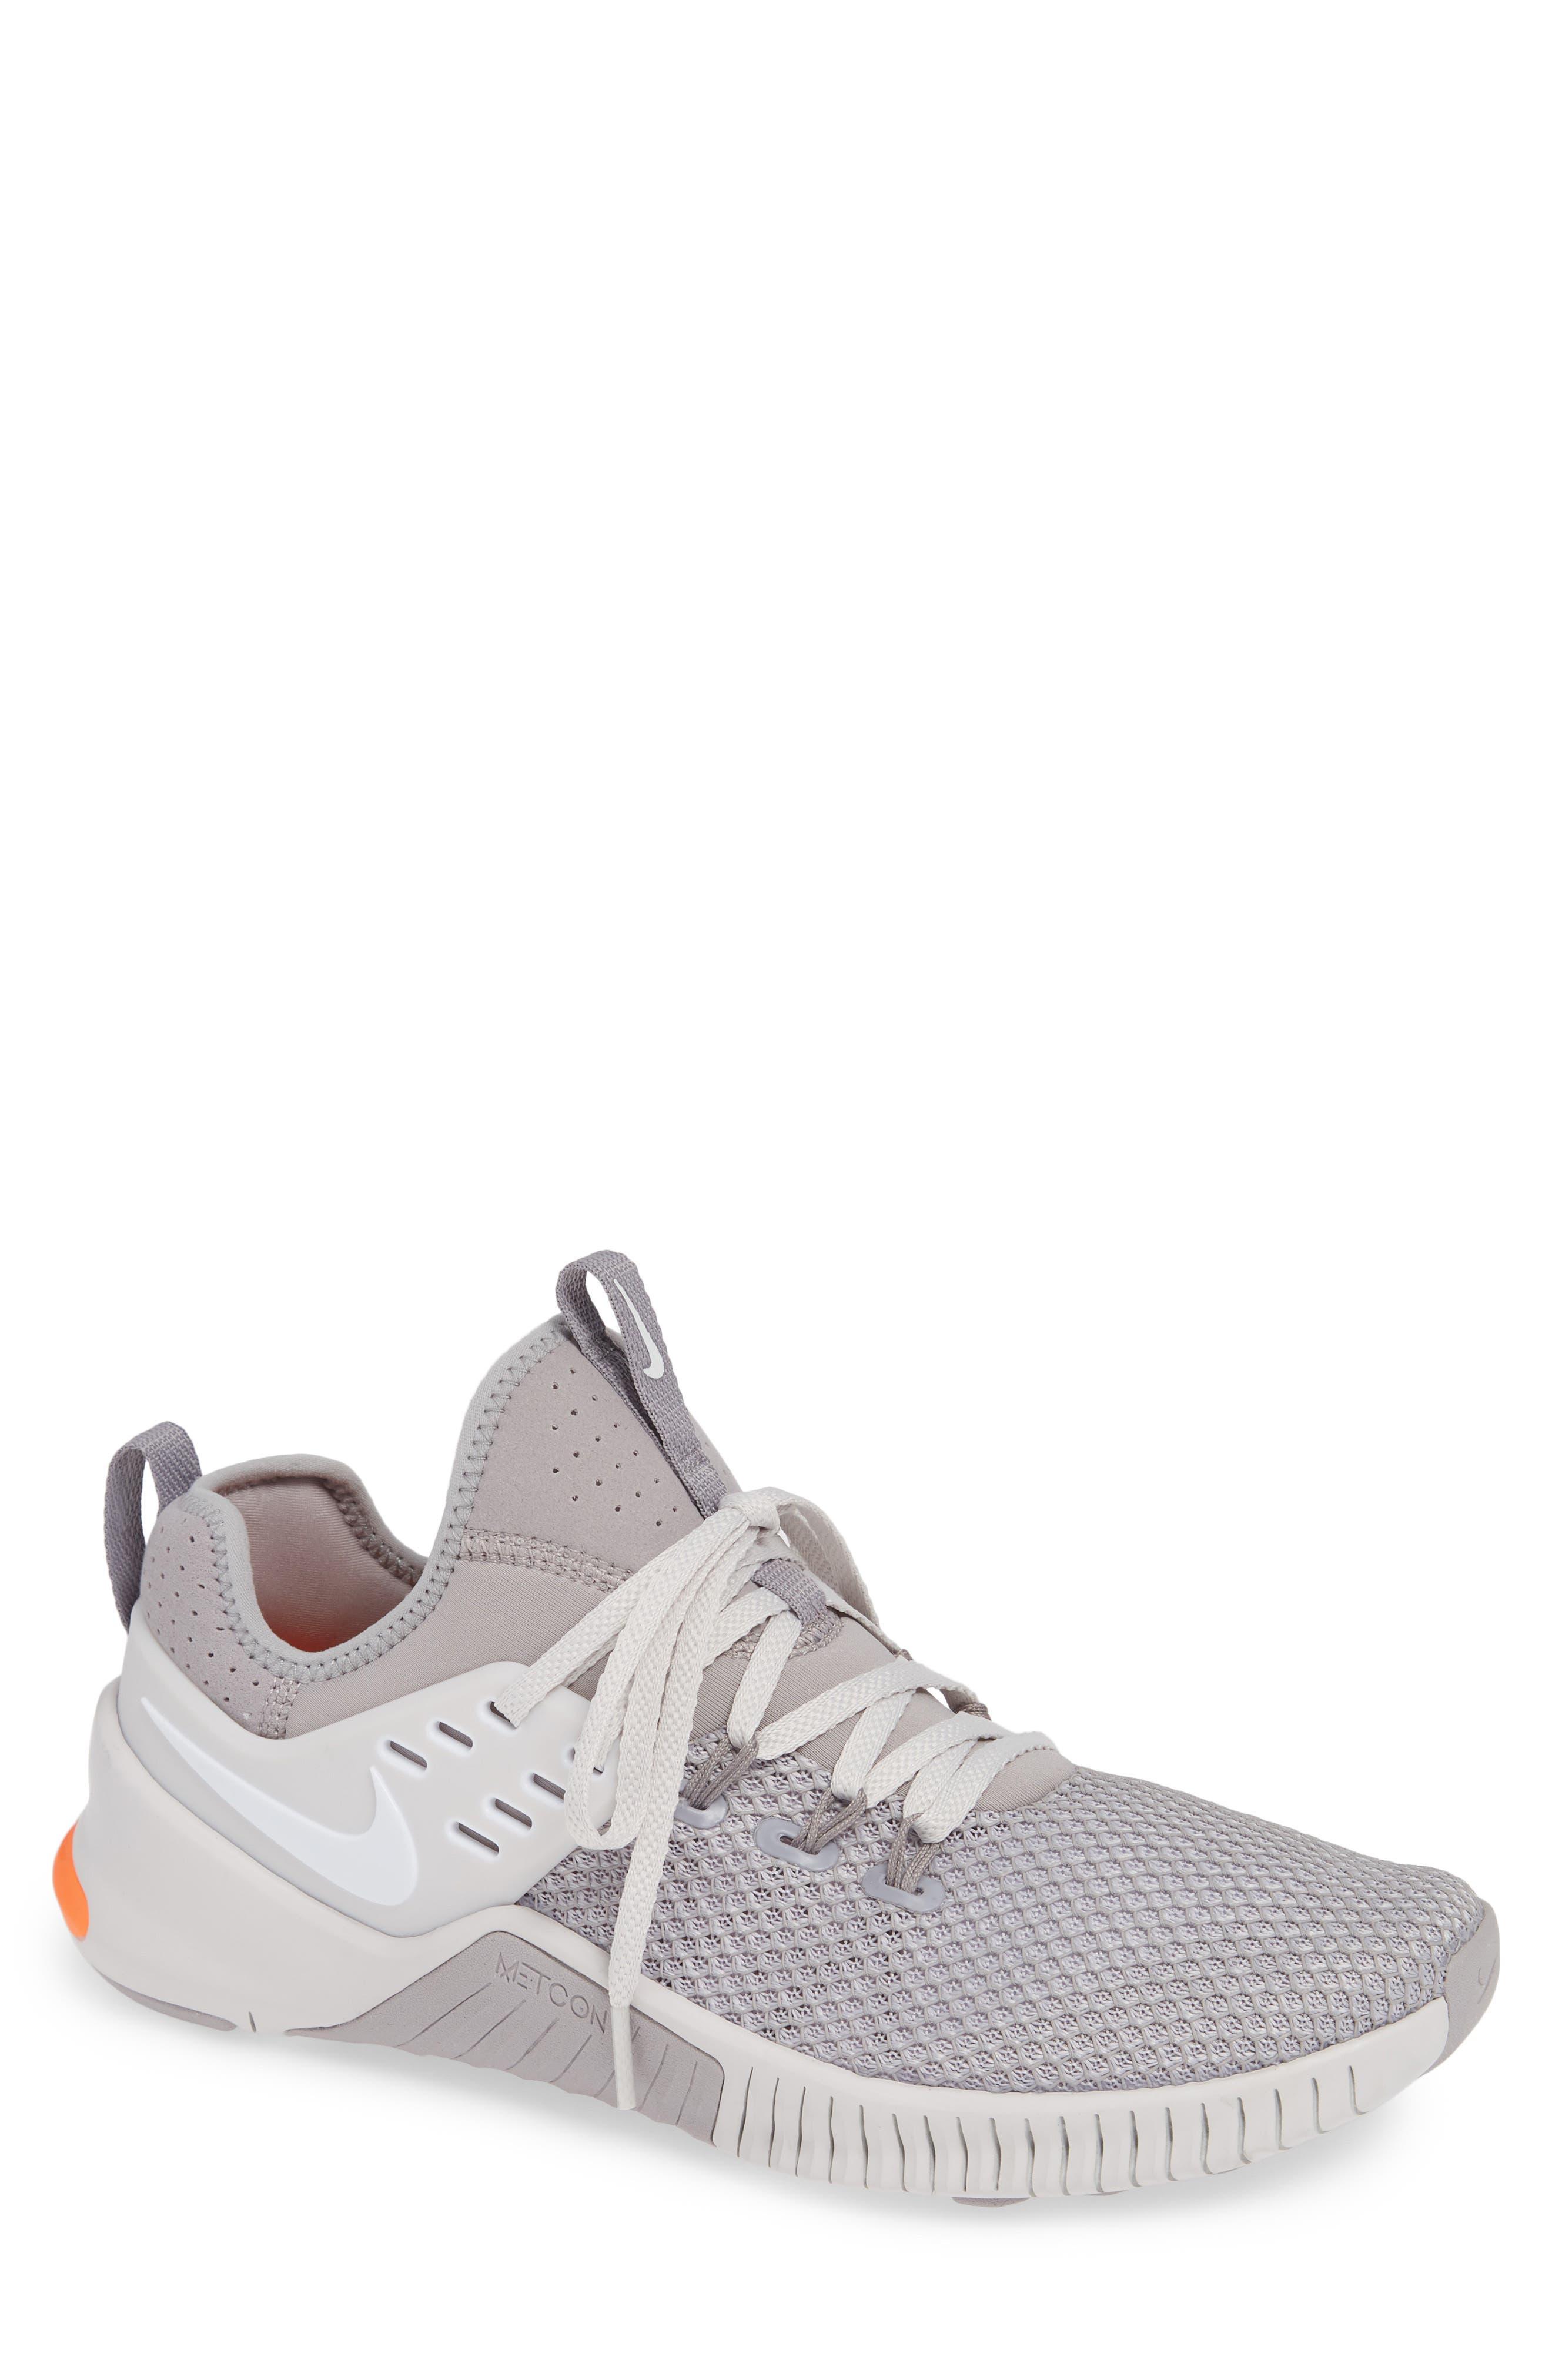 Free x Metcon Training Shoe,                             Main thumbnail 1, color,                             GREY/ WHITE/ CRIMSON